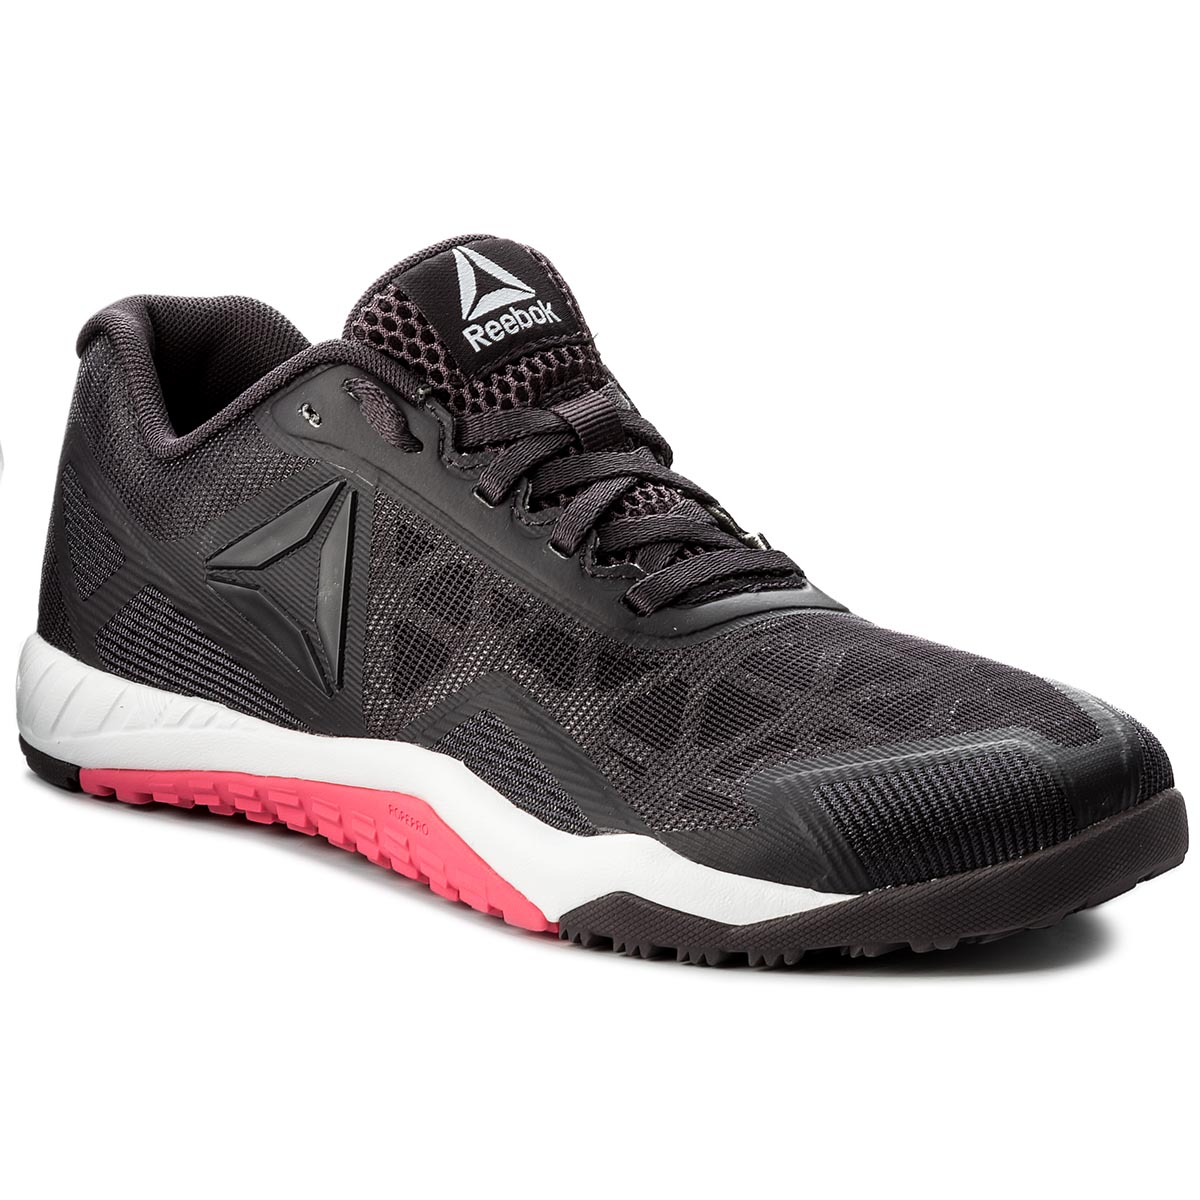 Shoes Reebok - Sprint Tr CN1230 Urban Maroon/Pink/Chalk